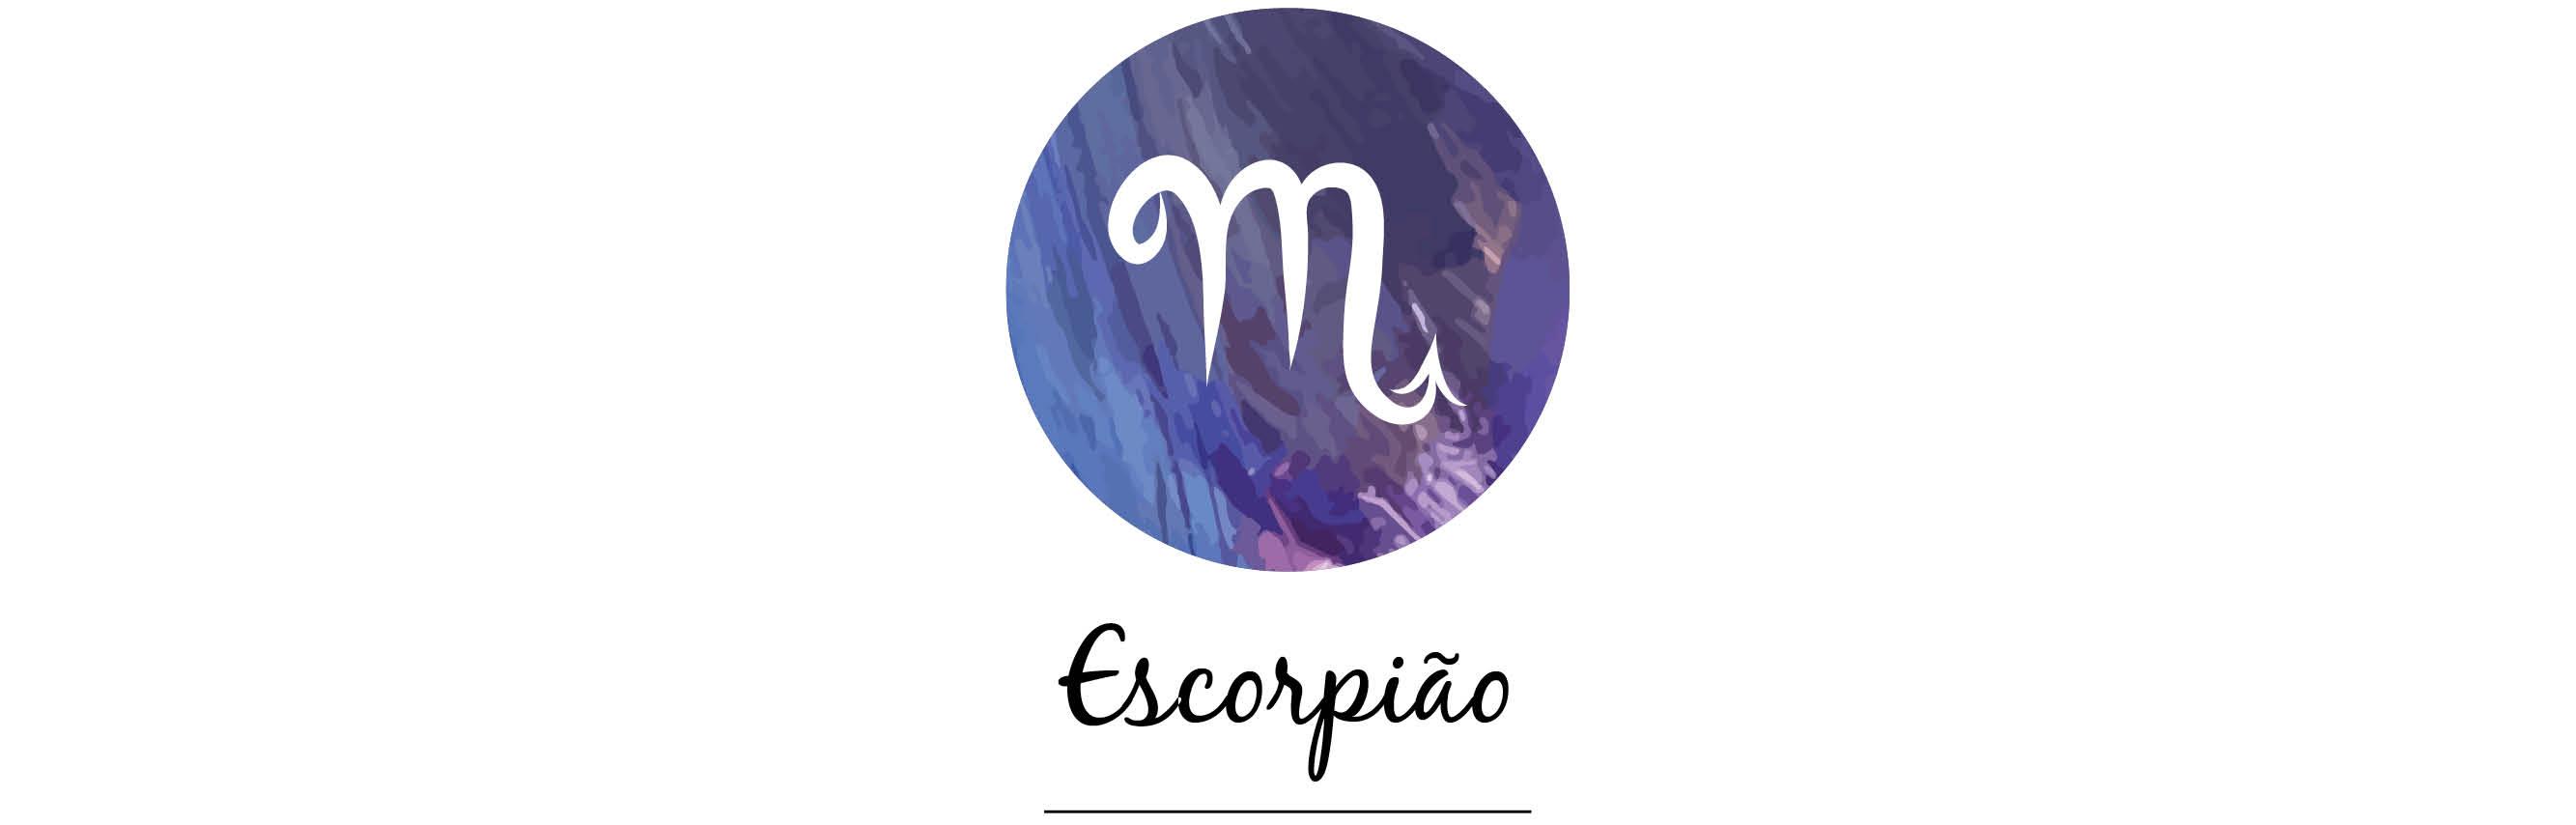 Escorpiao1